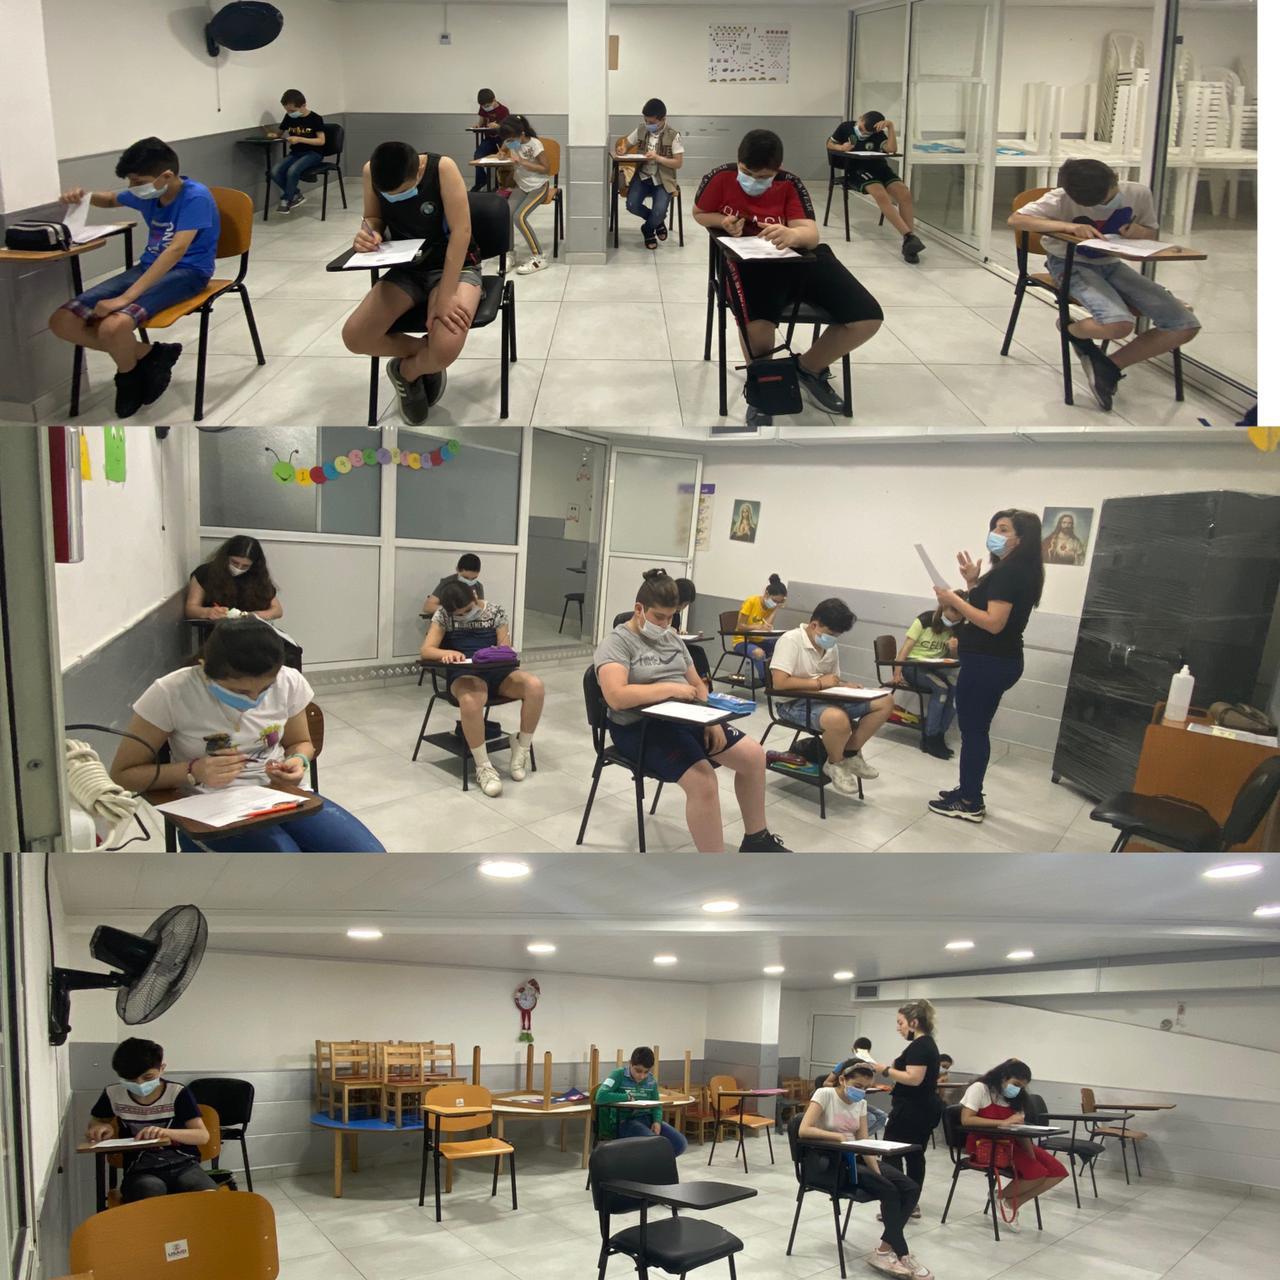 Exams end at St Thomas the Apostle Chaldean Educational Centre